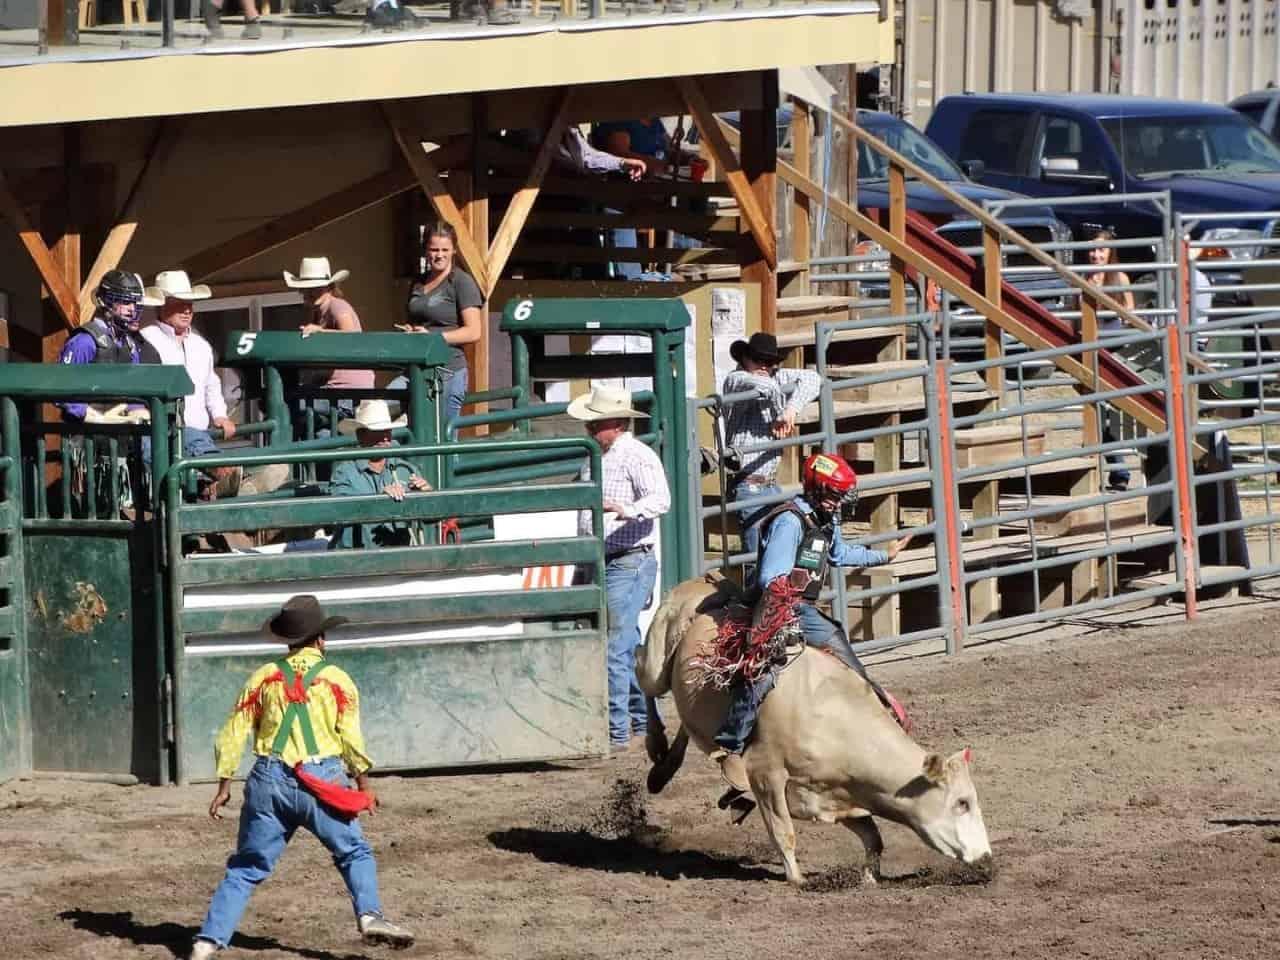 Nicola Valley Pro Rodeo Association.